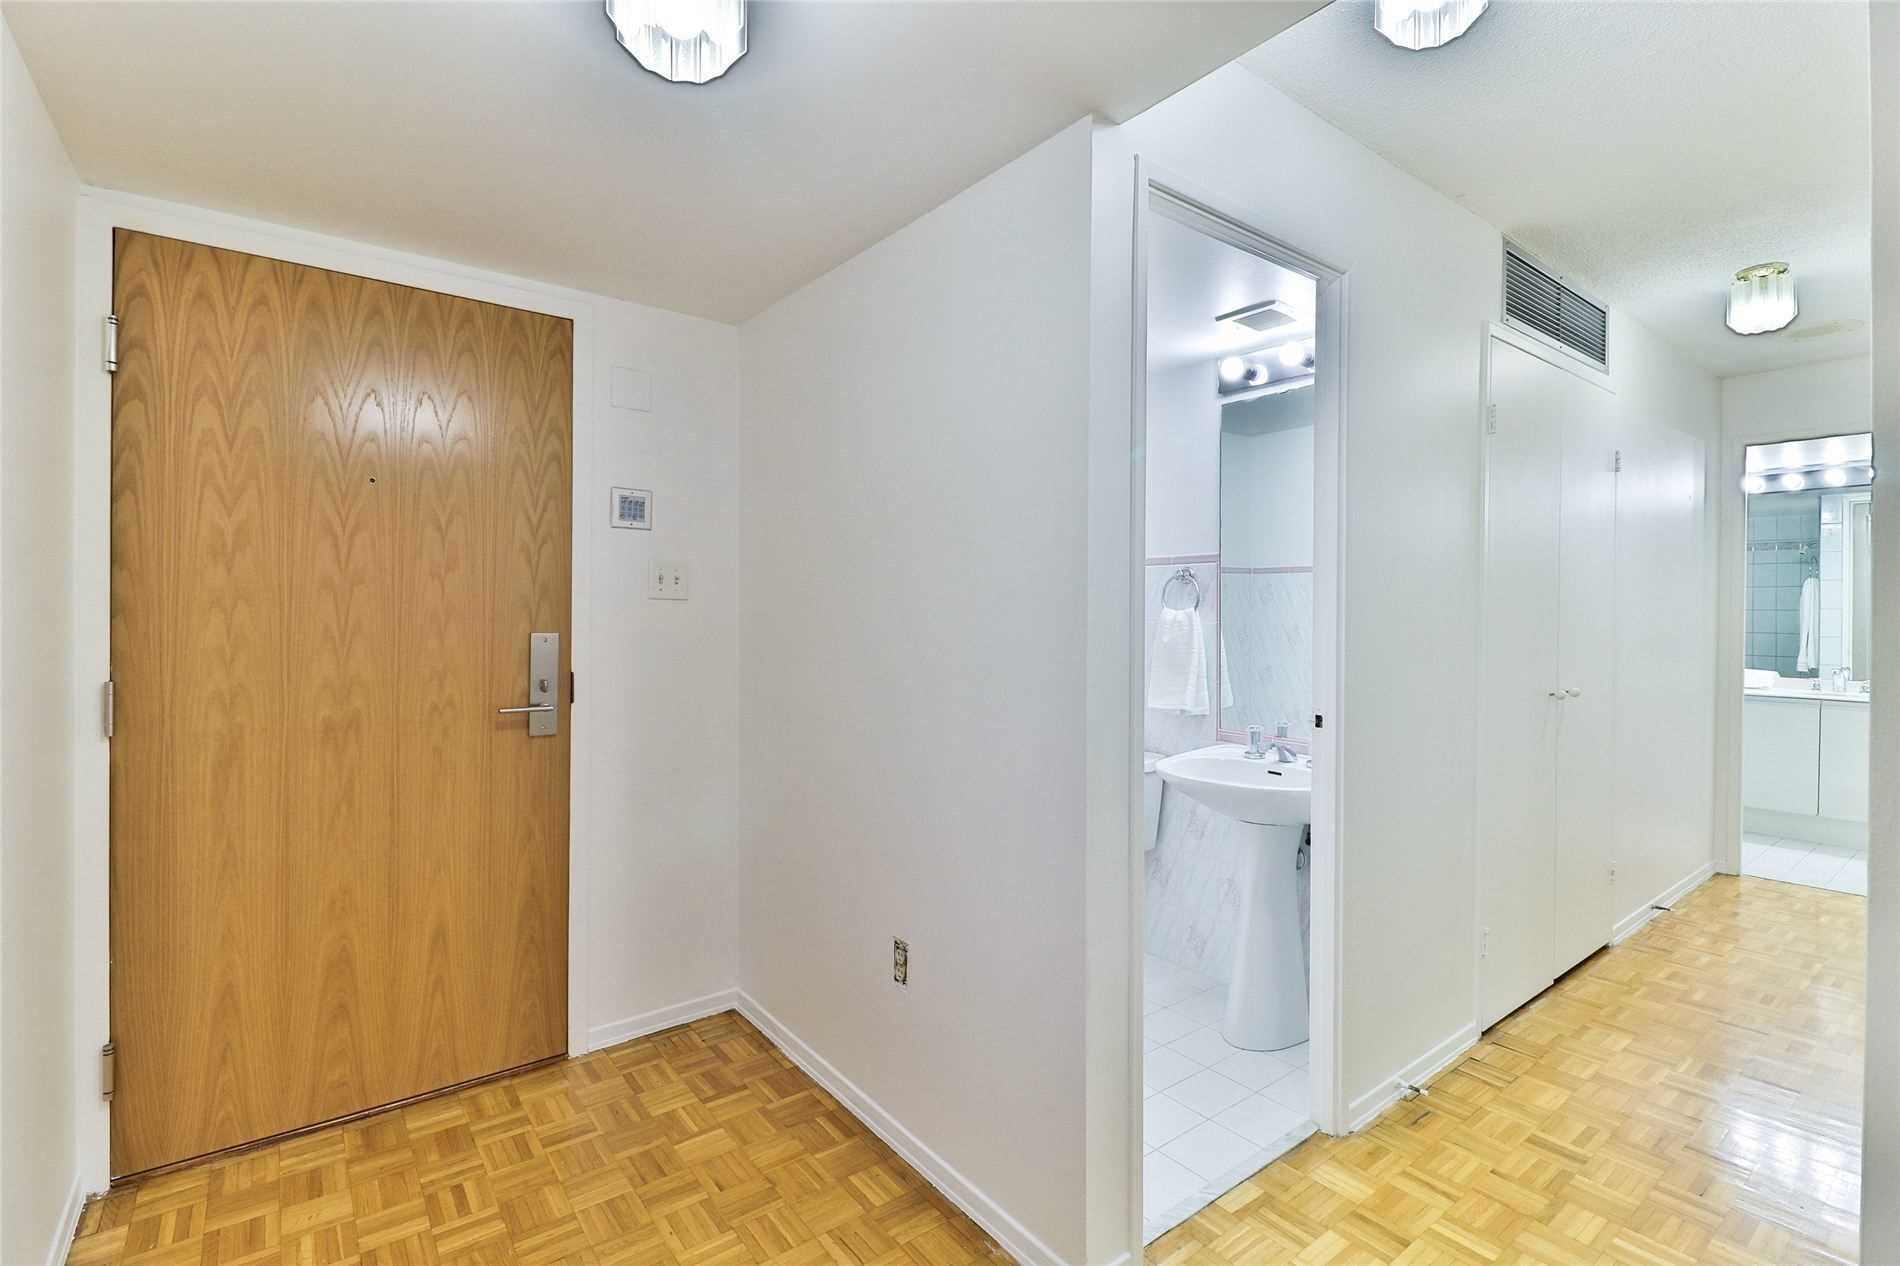 304 - 35 Church St - Church-Yonge Corridor Condo Apt for sale, 1 Bedroom (C5399330) - #18